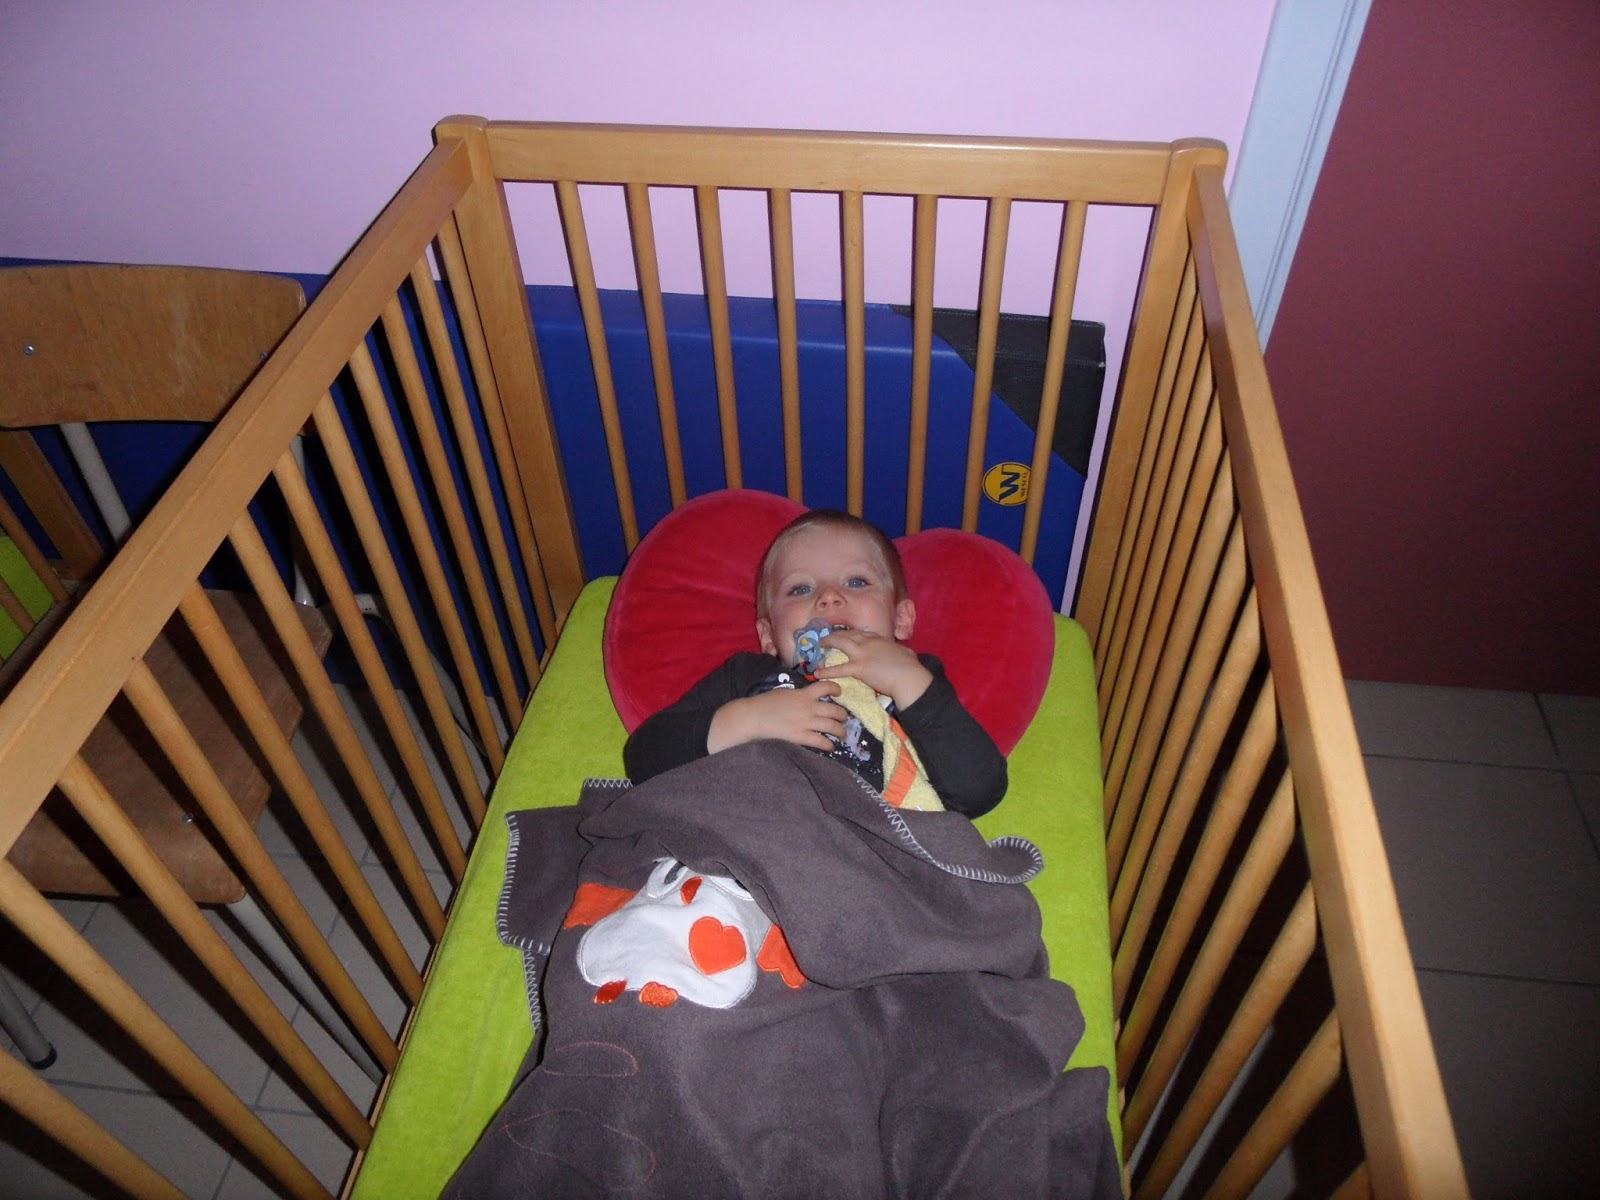 ecole communale maternelle le nid houtaing. Black Bedroom Furniture Sets. Home Design Ideas